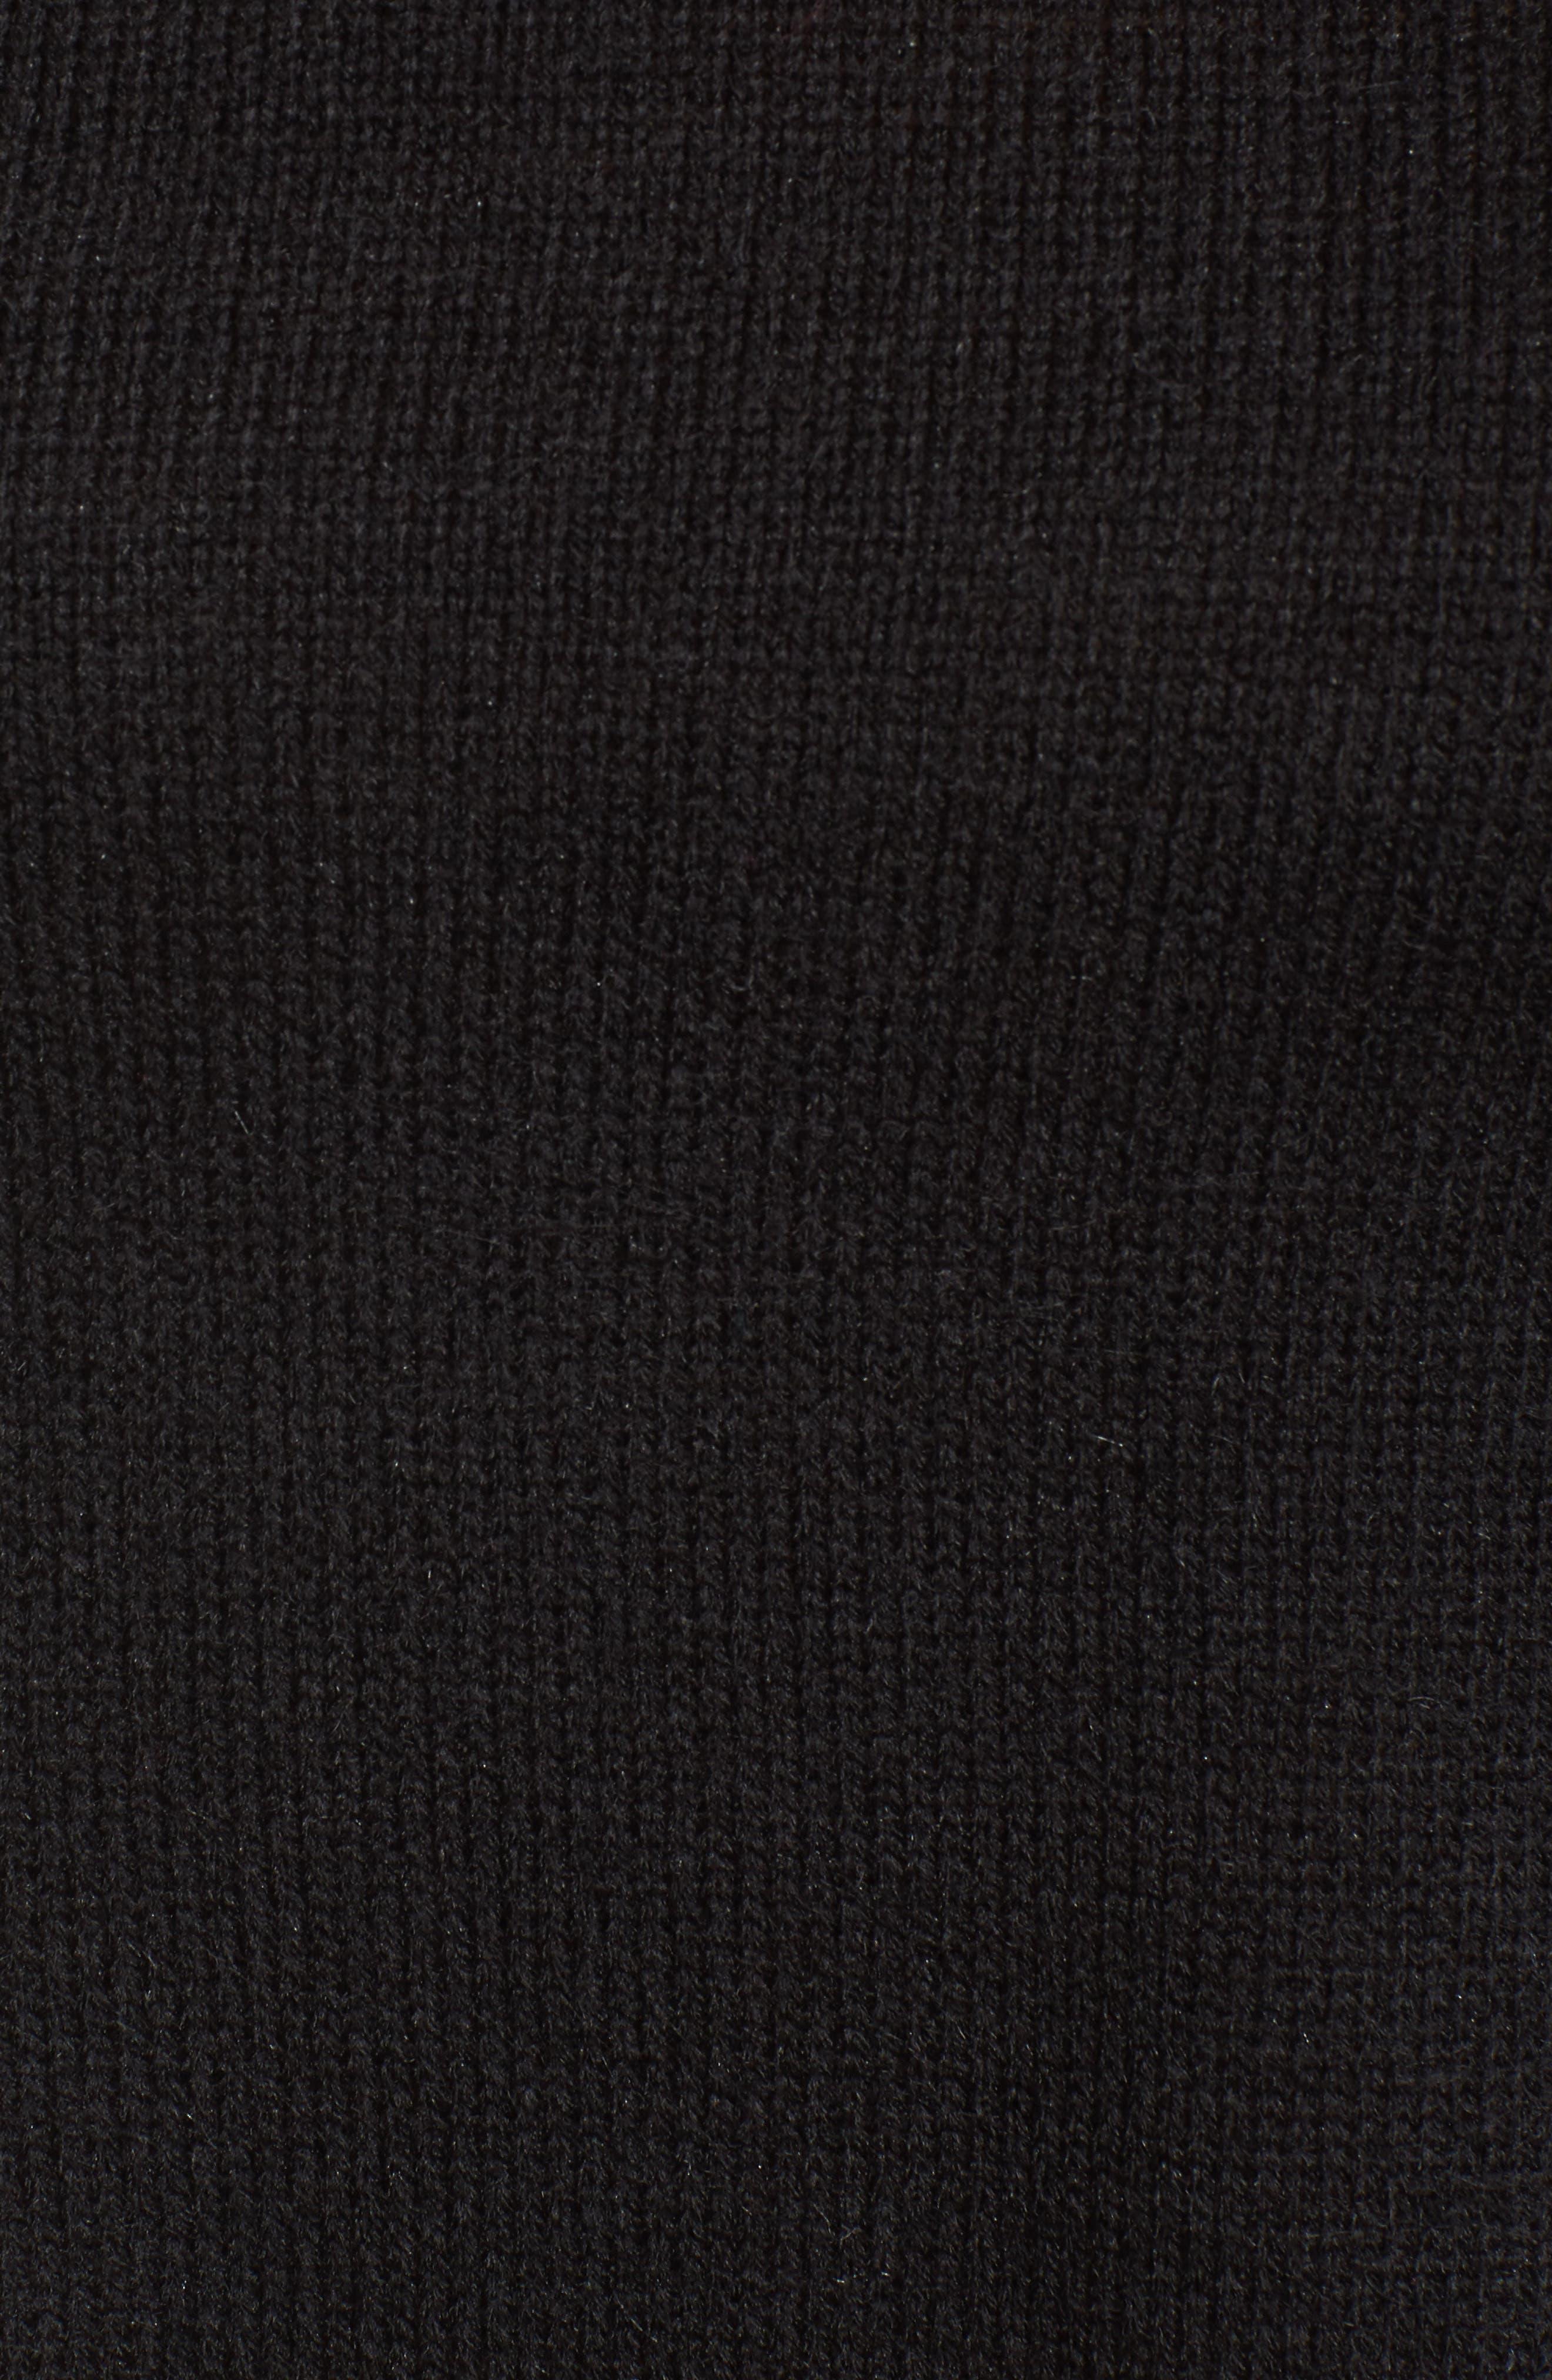 Imitation Pearl & Ruffle Trim Sweater,                             Alternate thumbnail 5, color,                             001